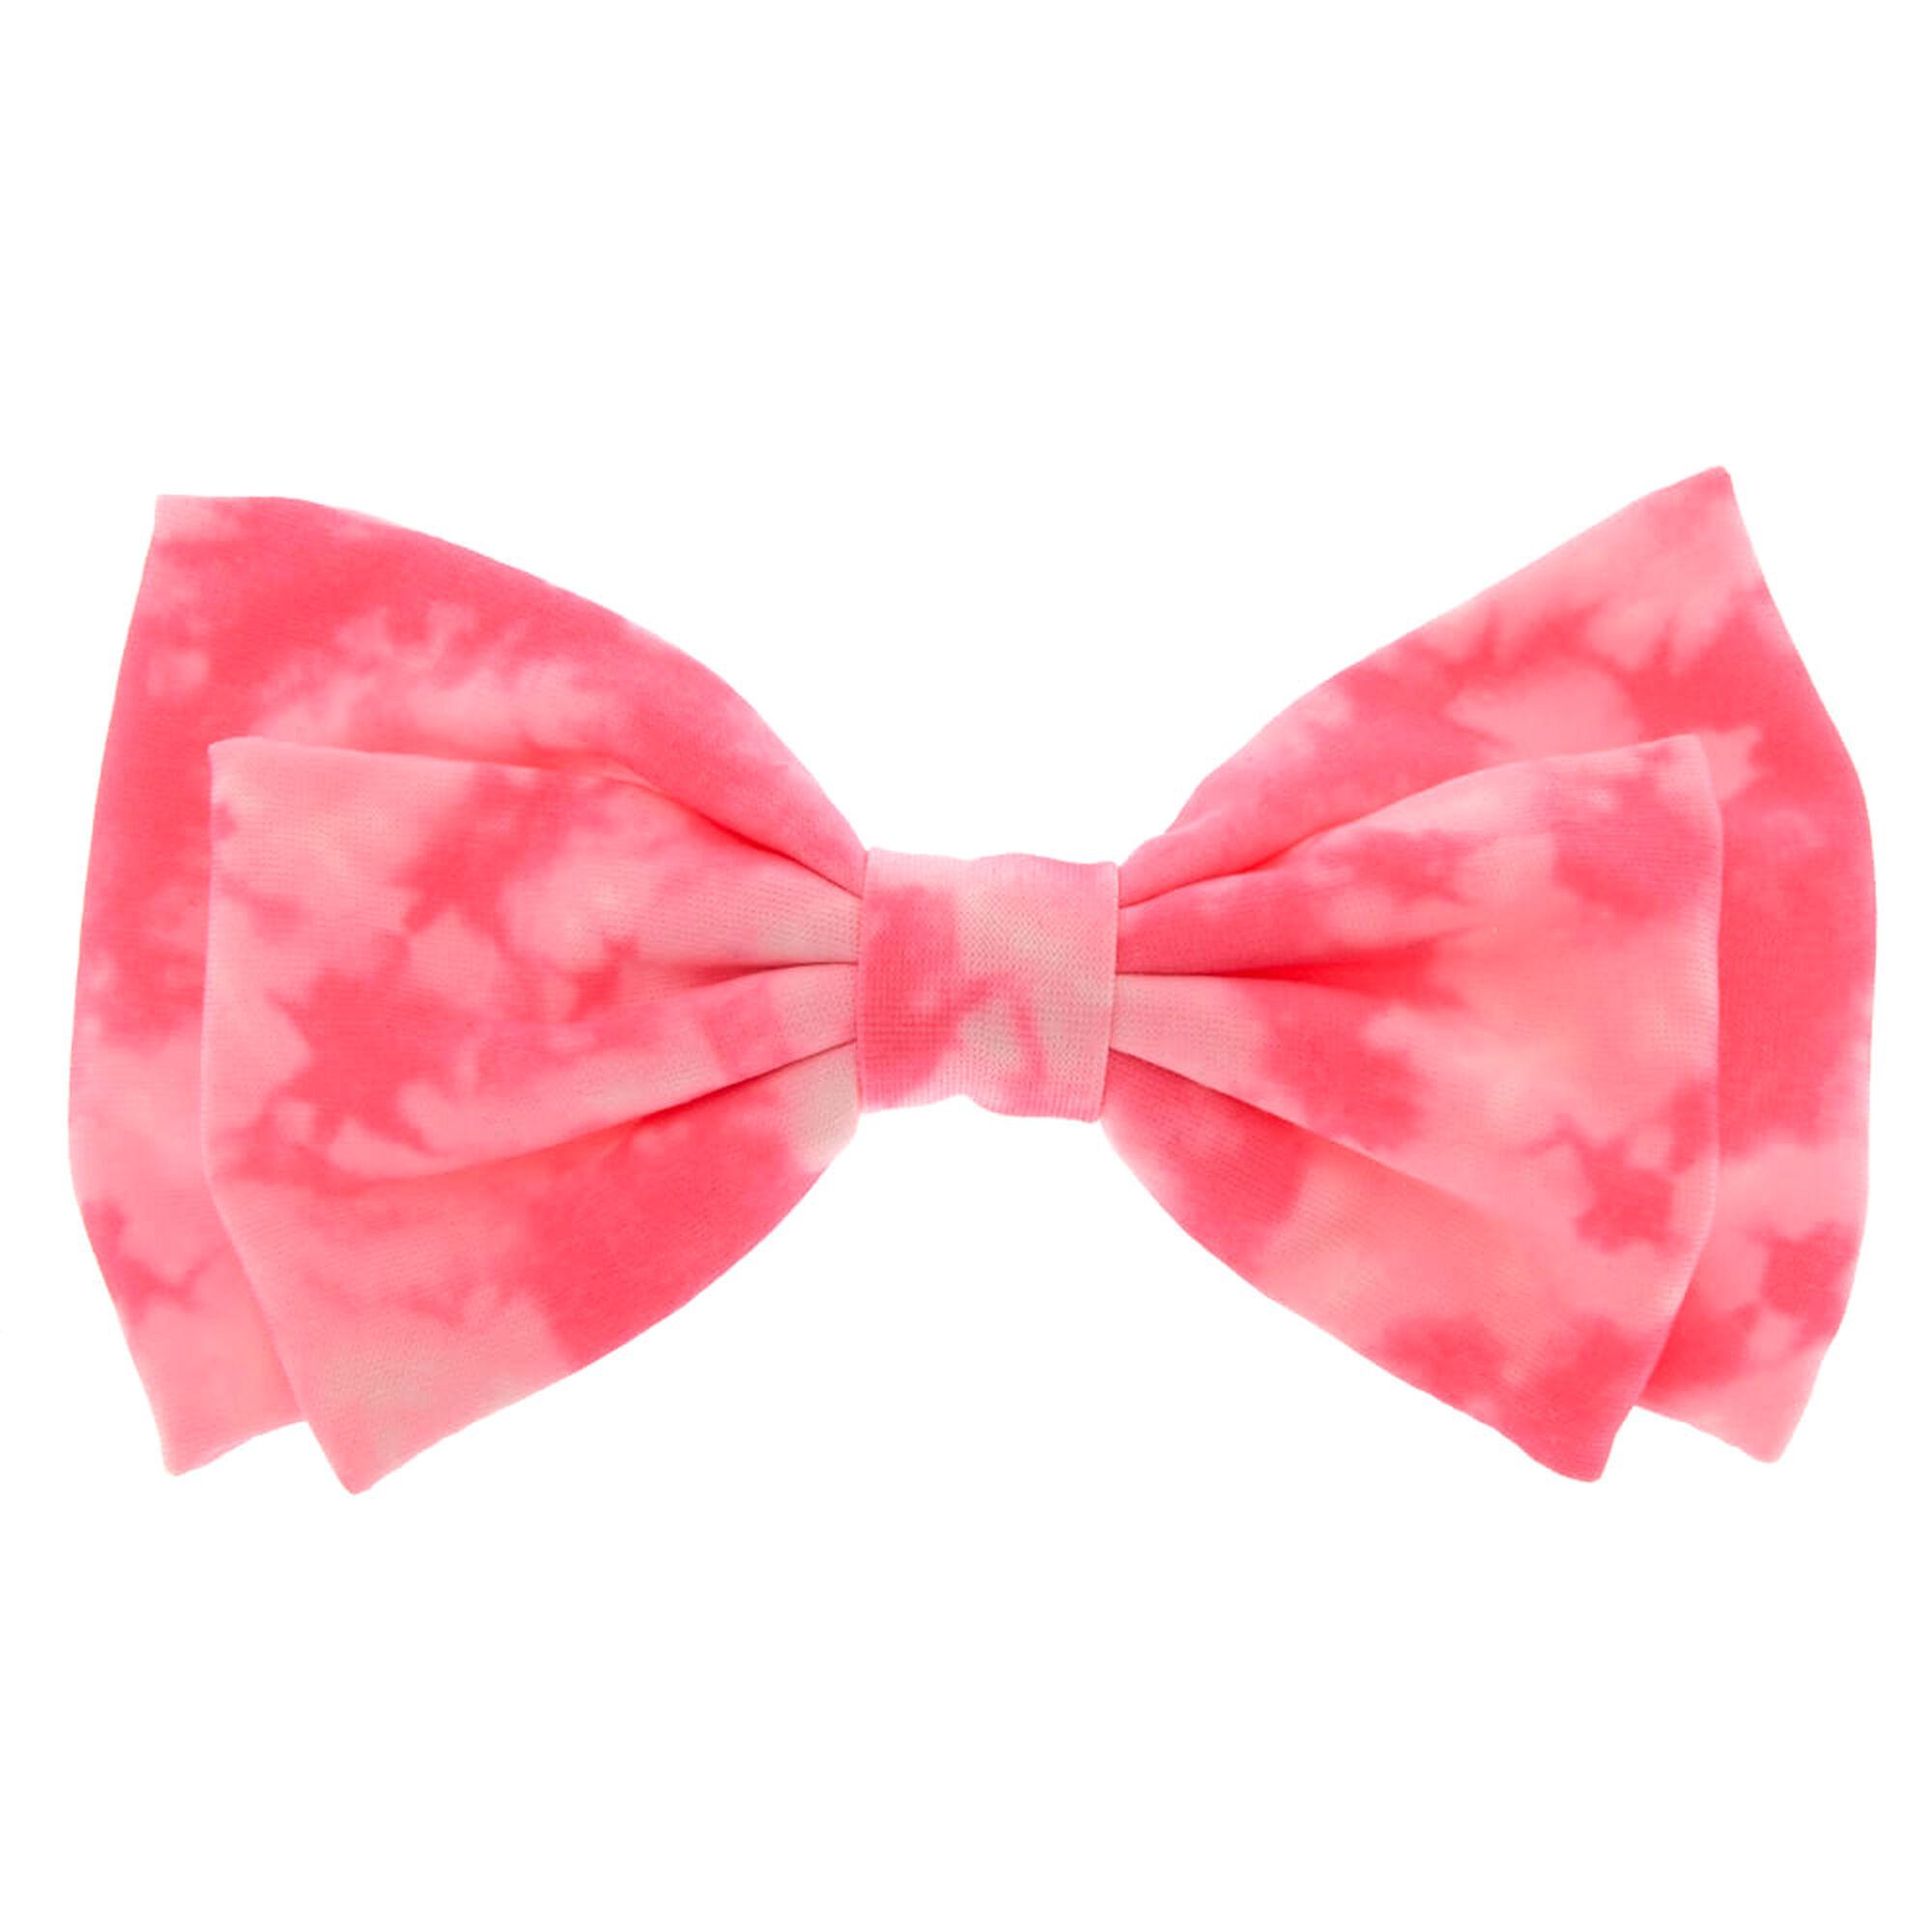 Neon Pink Tie Dye Hair Bow Clip